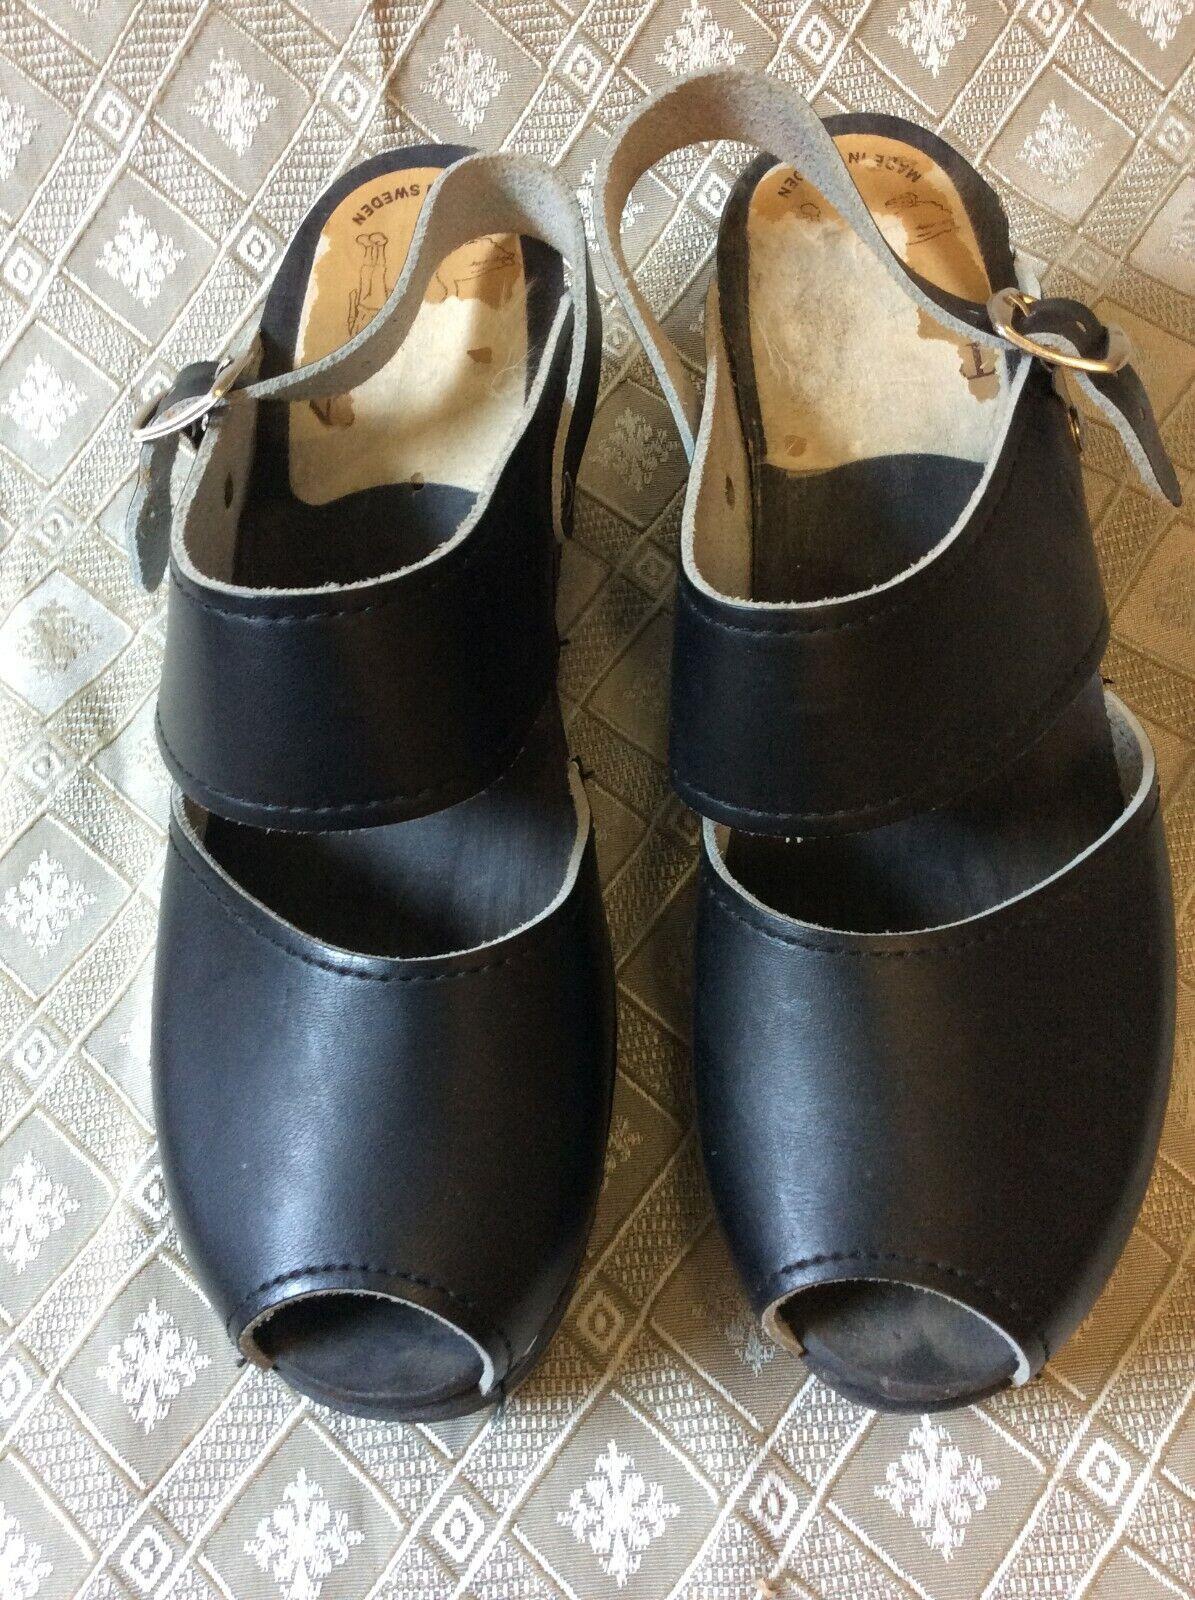 Toffeln Sz 41 Clogs Mule Slide Sweden mary jand sandal peep toe black shoes play